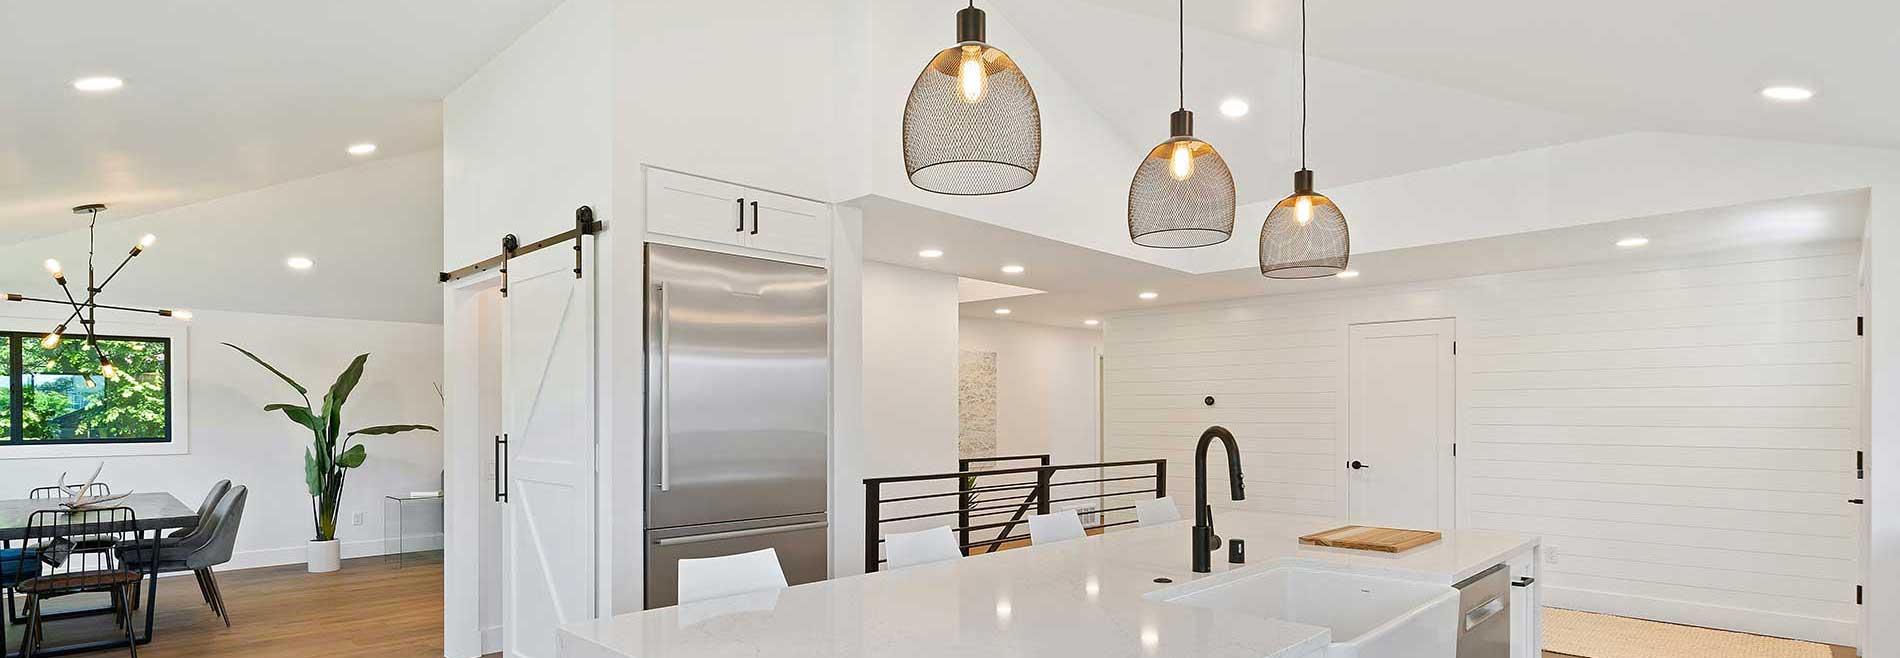 kitchen renovation adelaide homeimprovement